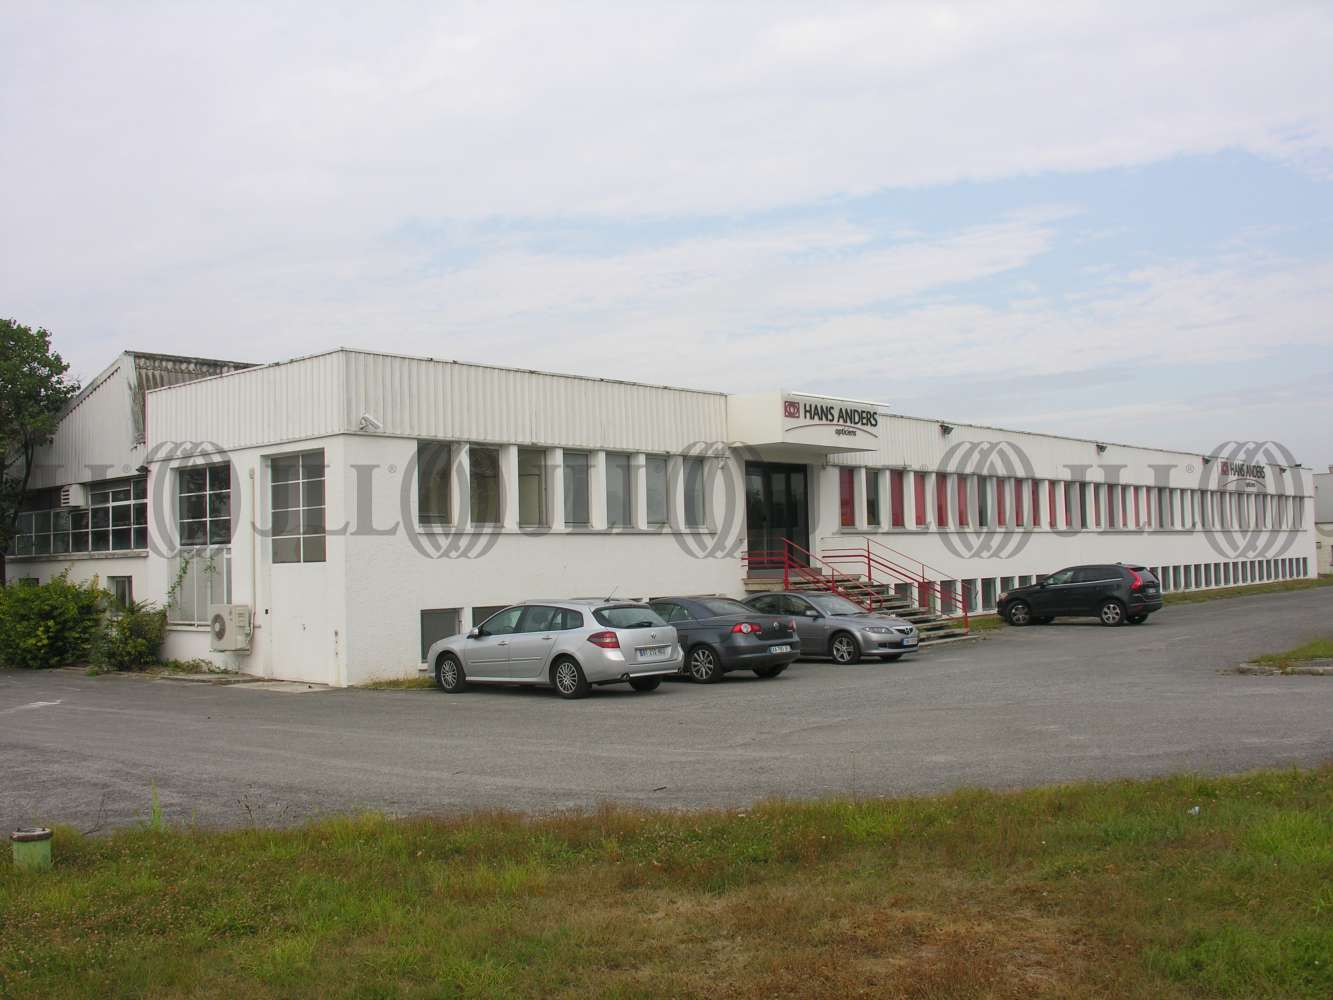 Activités/entrepôt Reims, 51100 - 8 RUE ANDRÉ HUET - 488701